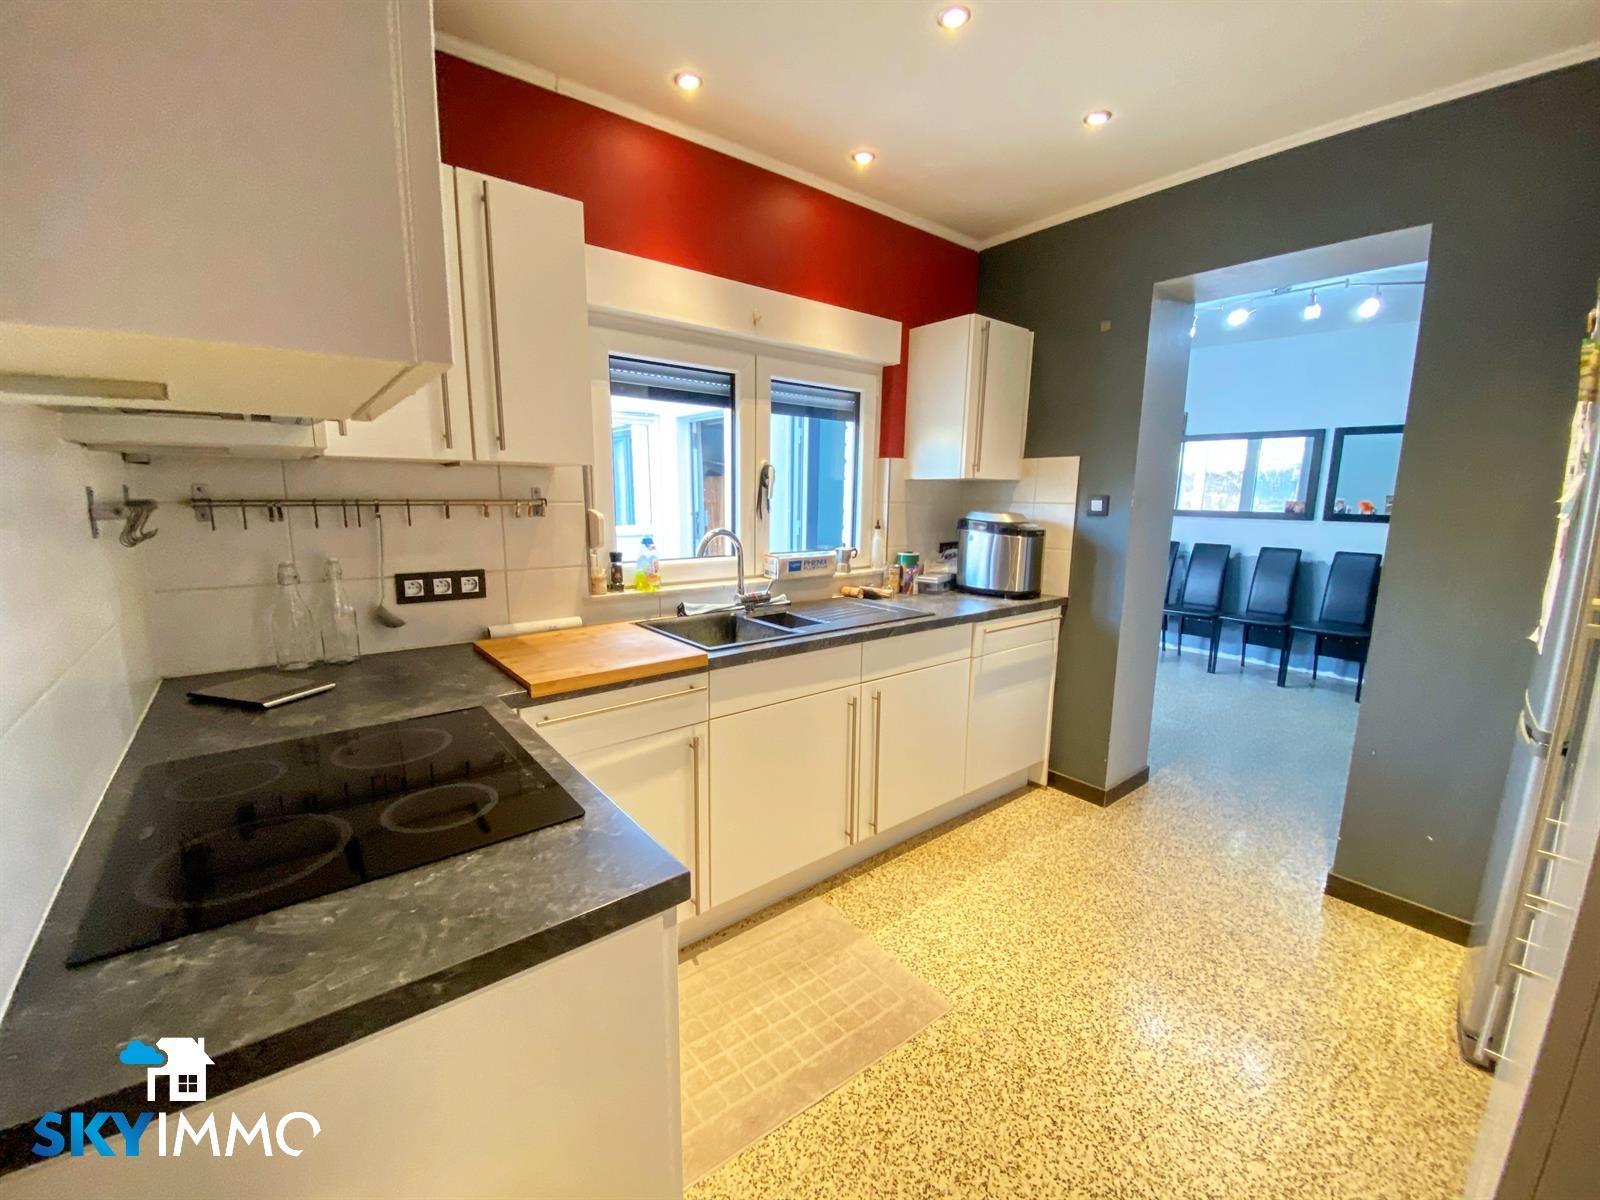 Maison - Saint-Nicolas - #4287983-8